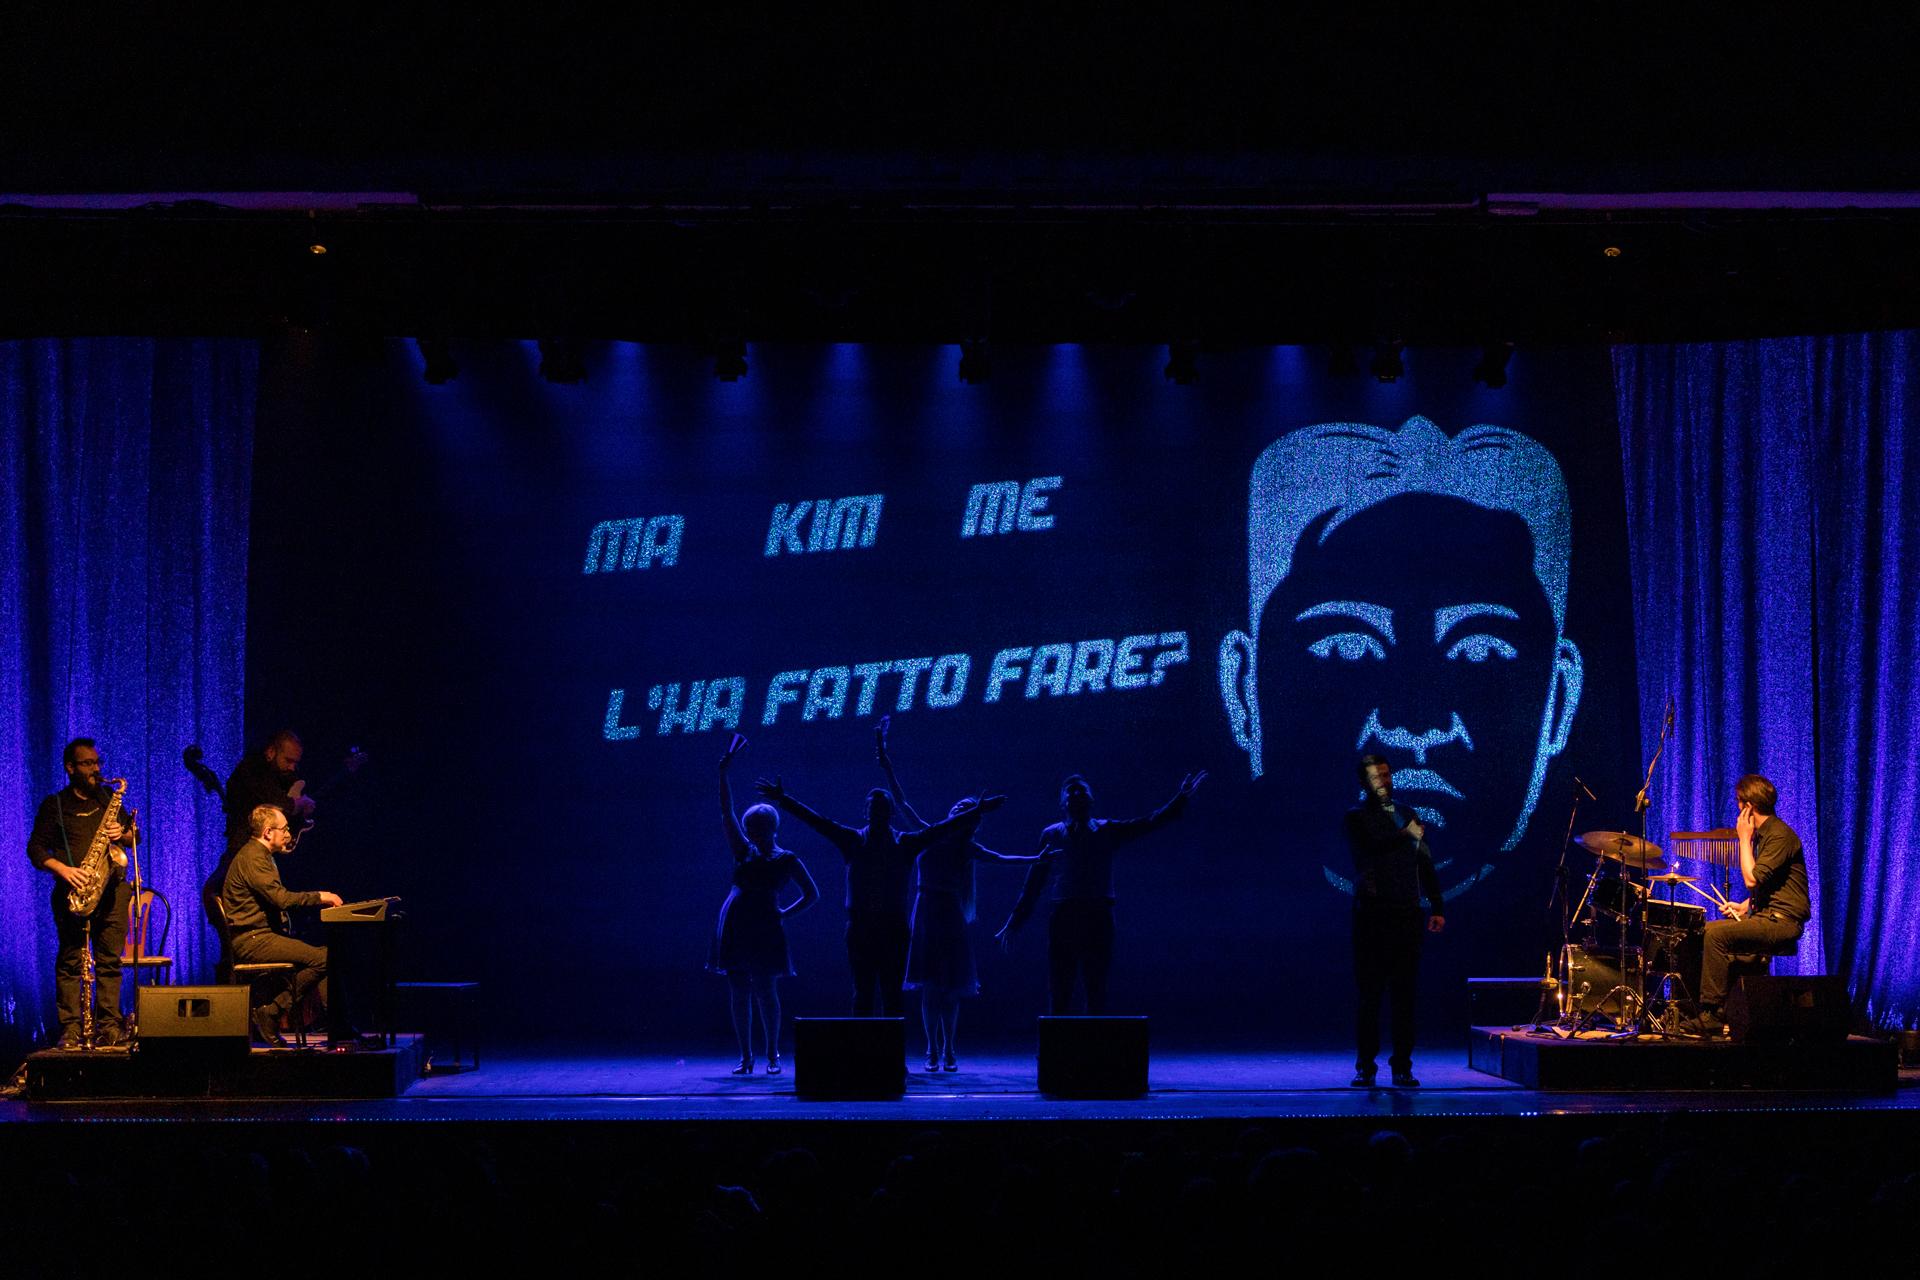 2019_03_12-Blue-Il-Musical-©-Luca-Vantusso-212156-EOSR3994